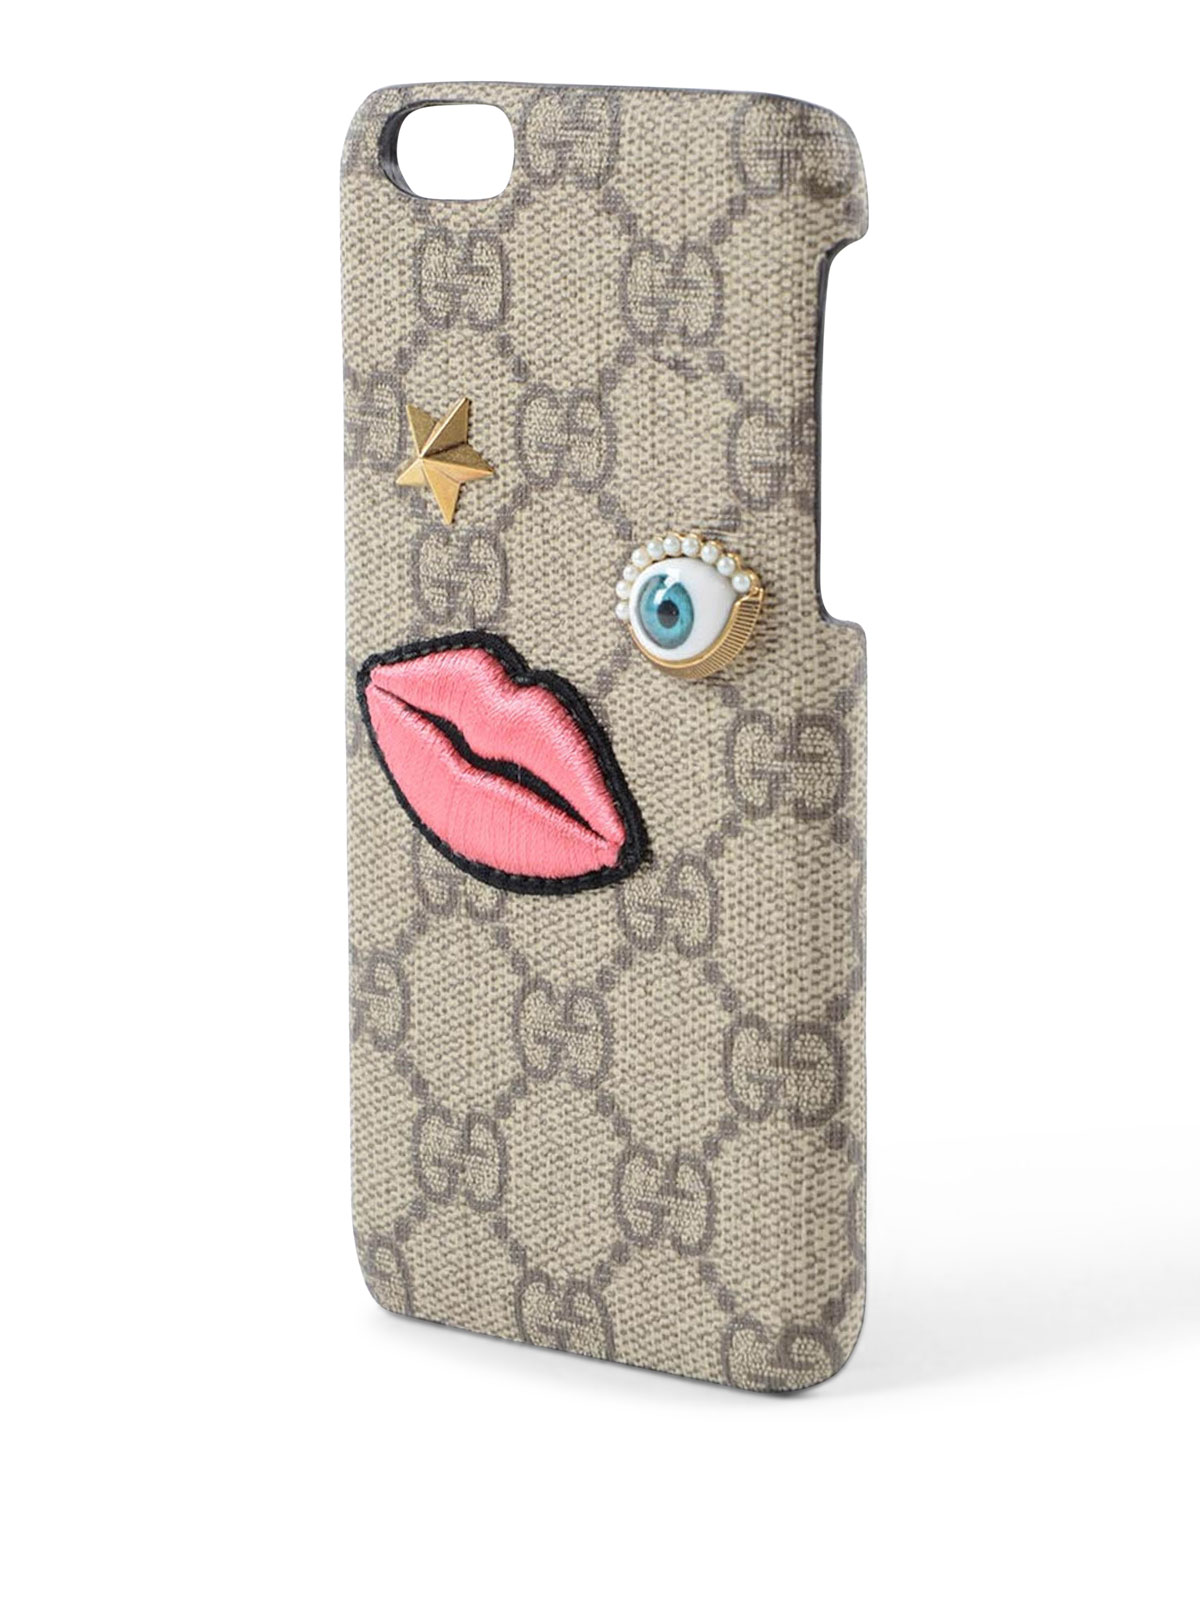 meet c2b1f b2c58 Gucci - GG Supreme iPhone 6 case - Cases & Covers - 431406 K05UT 8875